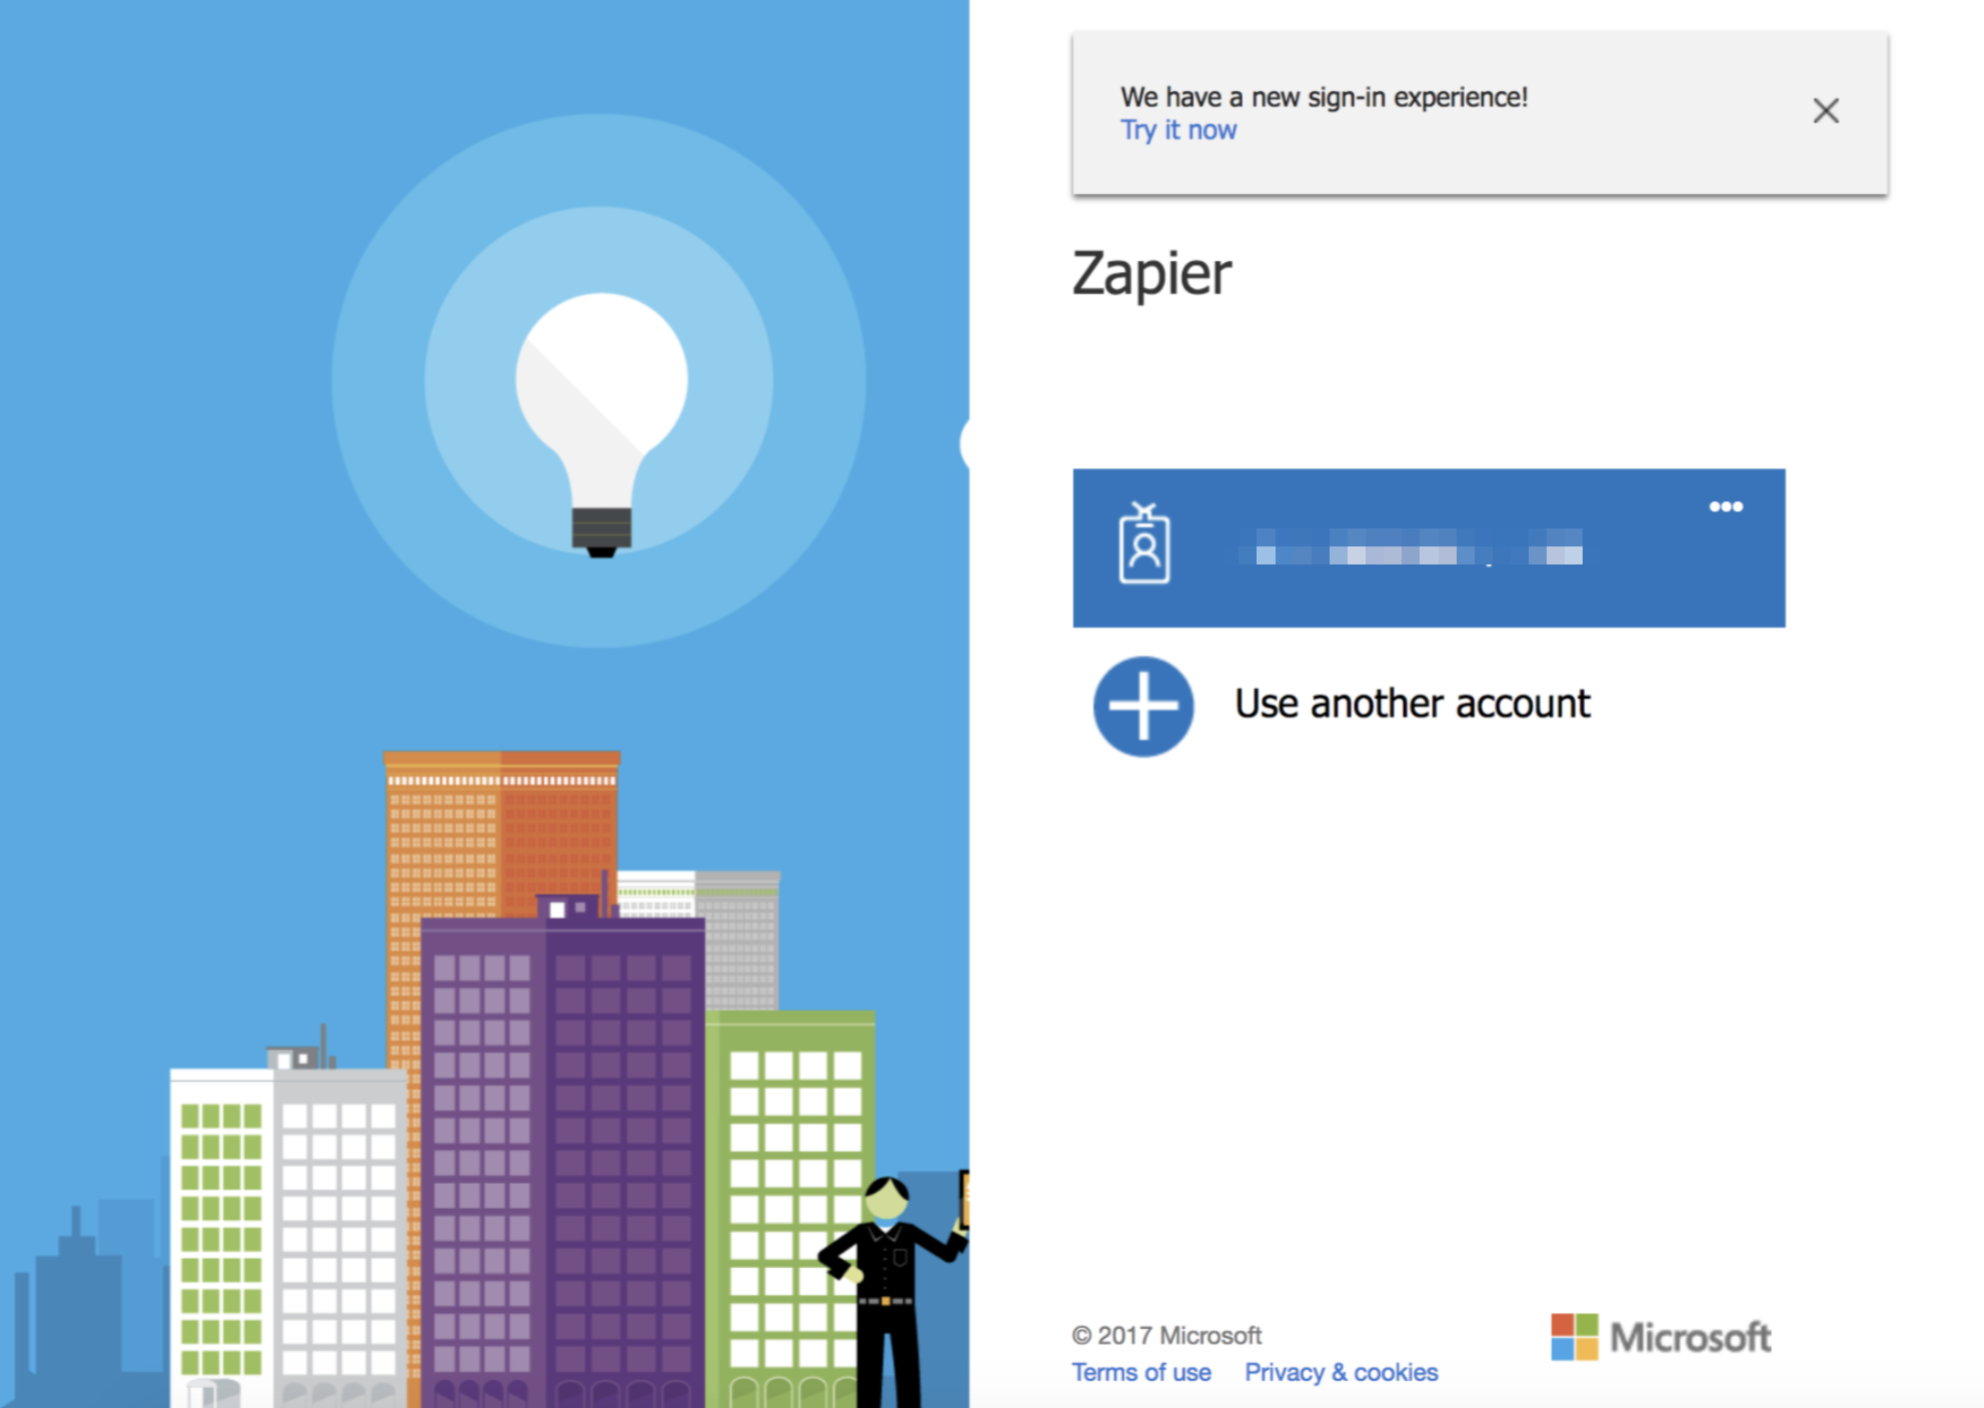 Microsoft Office 365 - Integration Help & Support | Zapier